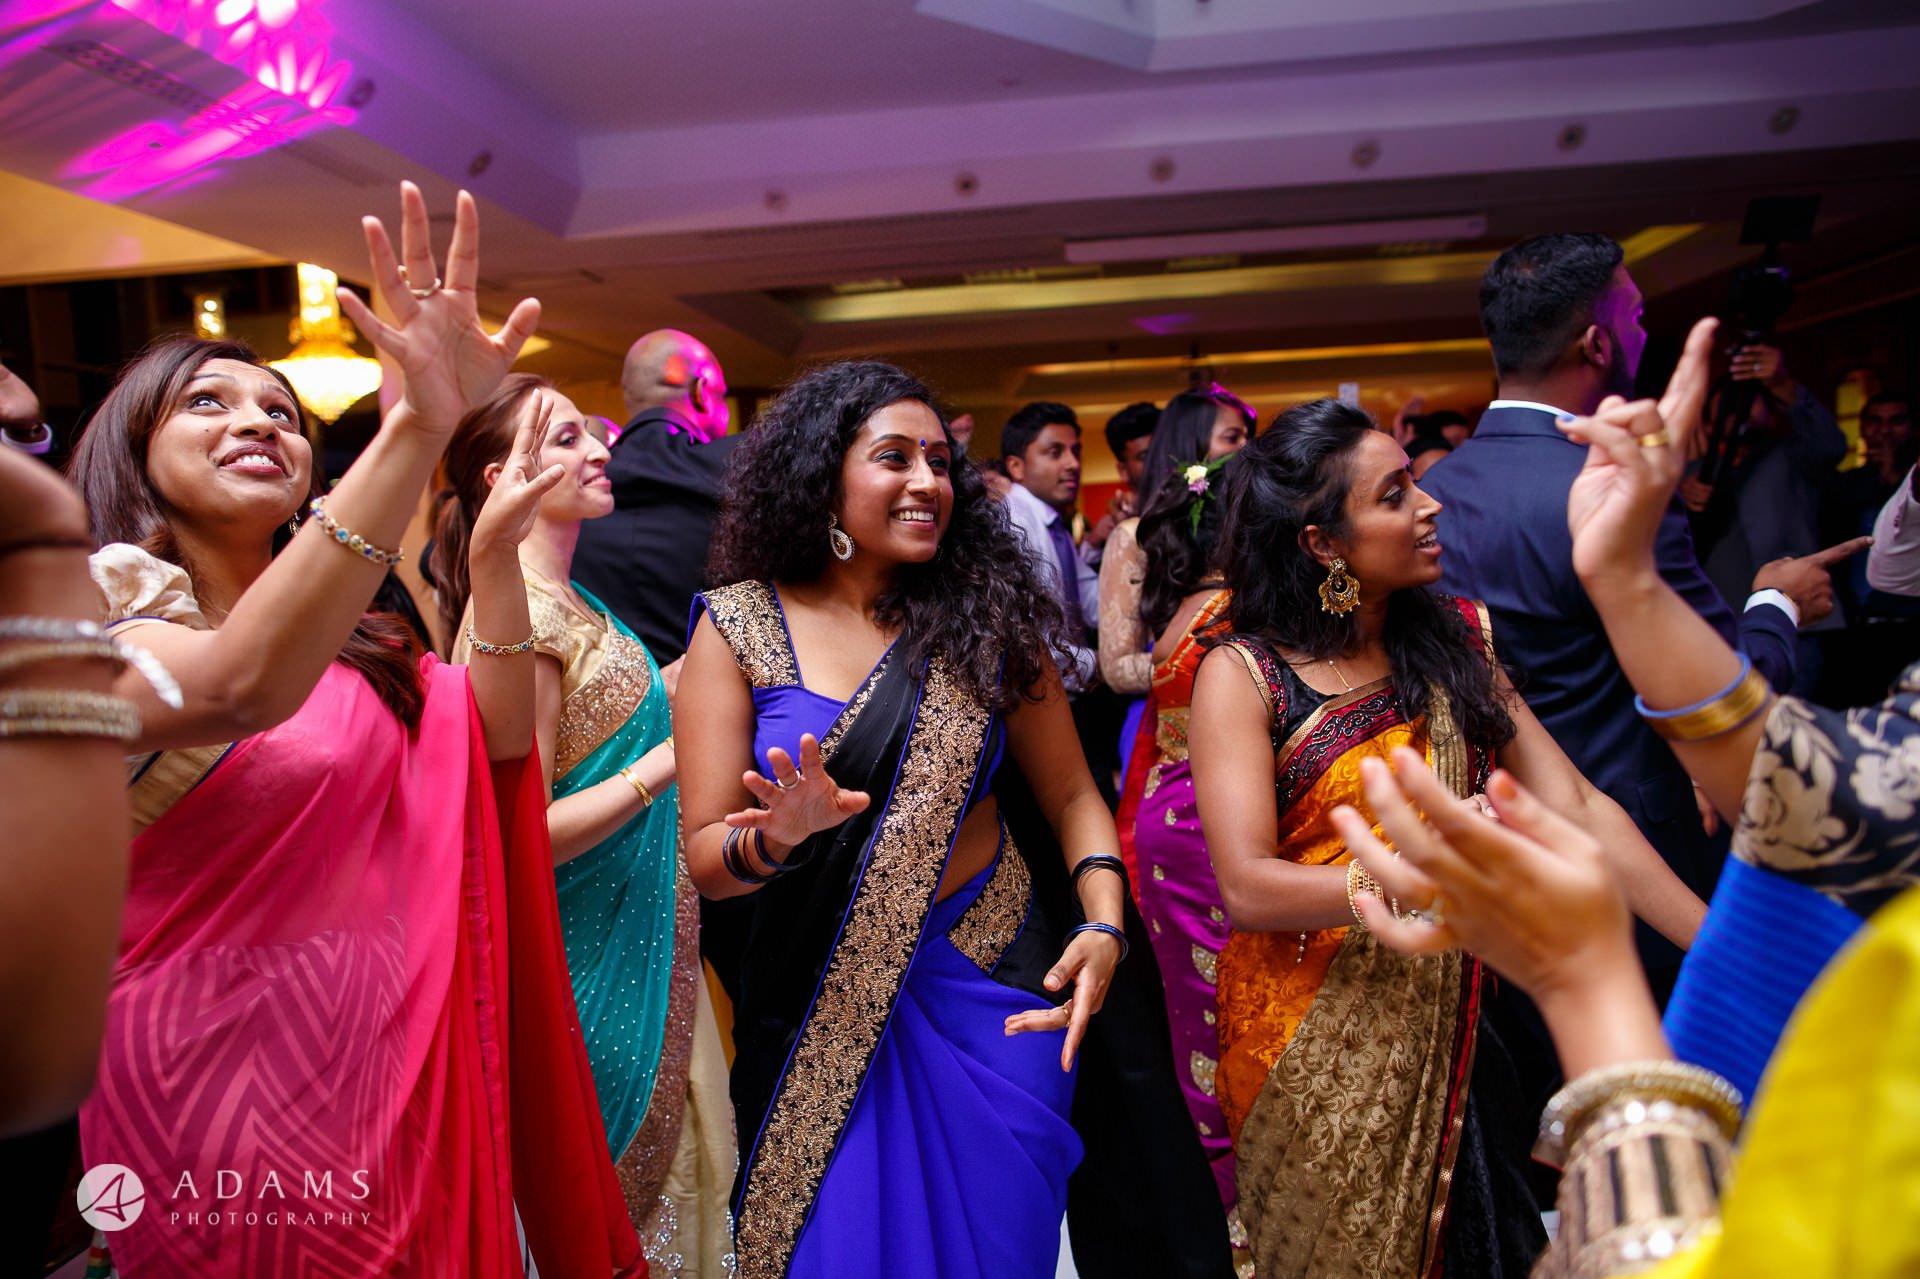 Baylis House Wedding Photographer | Sara + Anojan 31